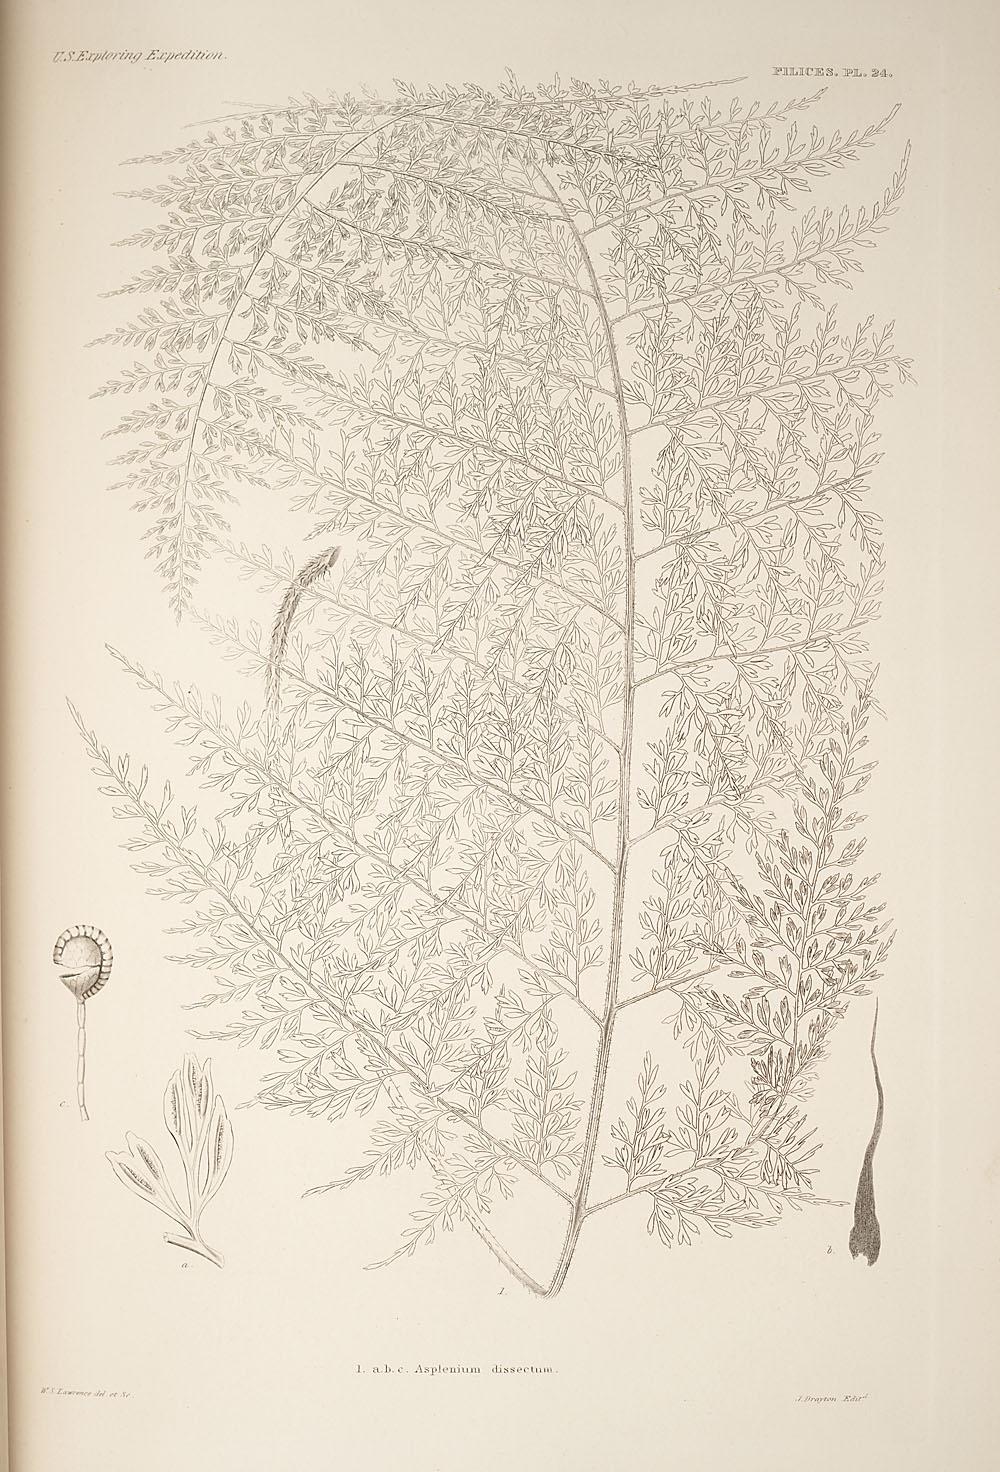 Fig. 1. Asplenium dissectum,  Image number:SIL19-24a-036